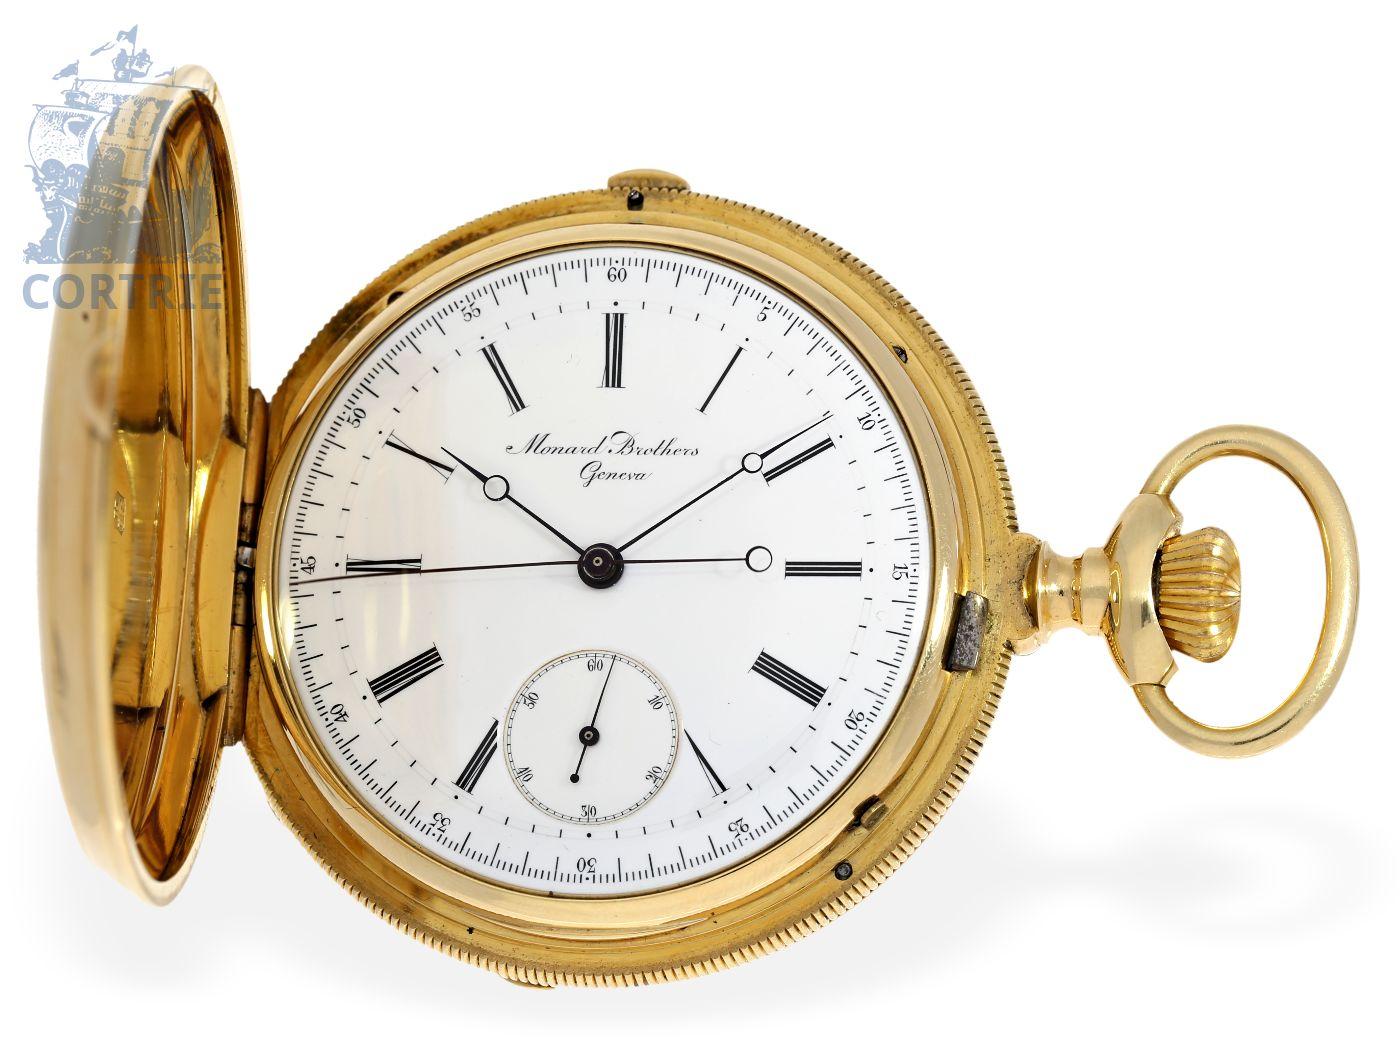 Pocket watch: heavy Geneva chronograph, prime quality Ankerchronometer, Jules Monard Geneve, ca. 1875-